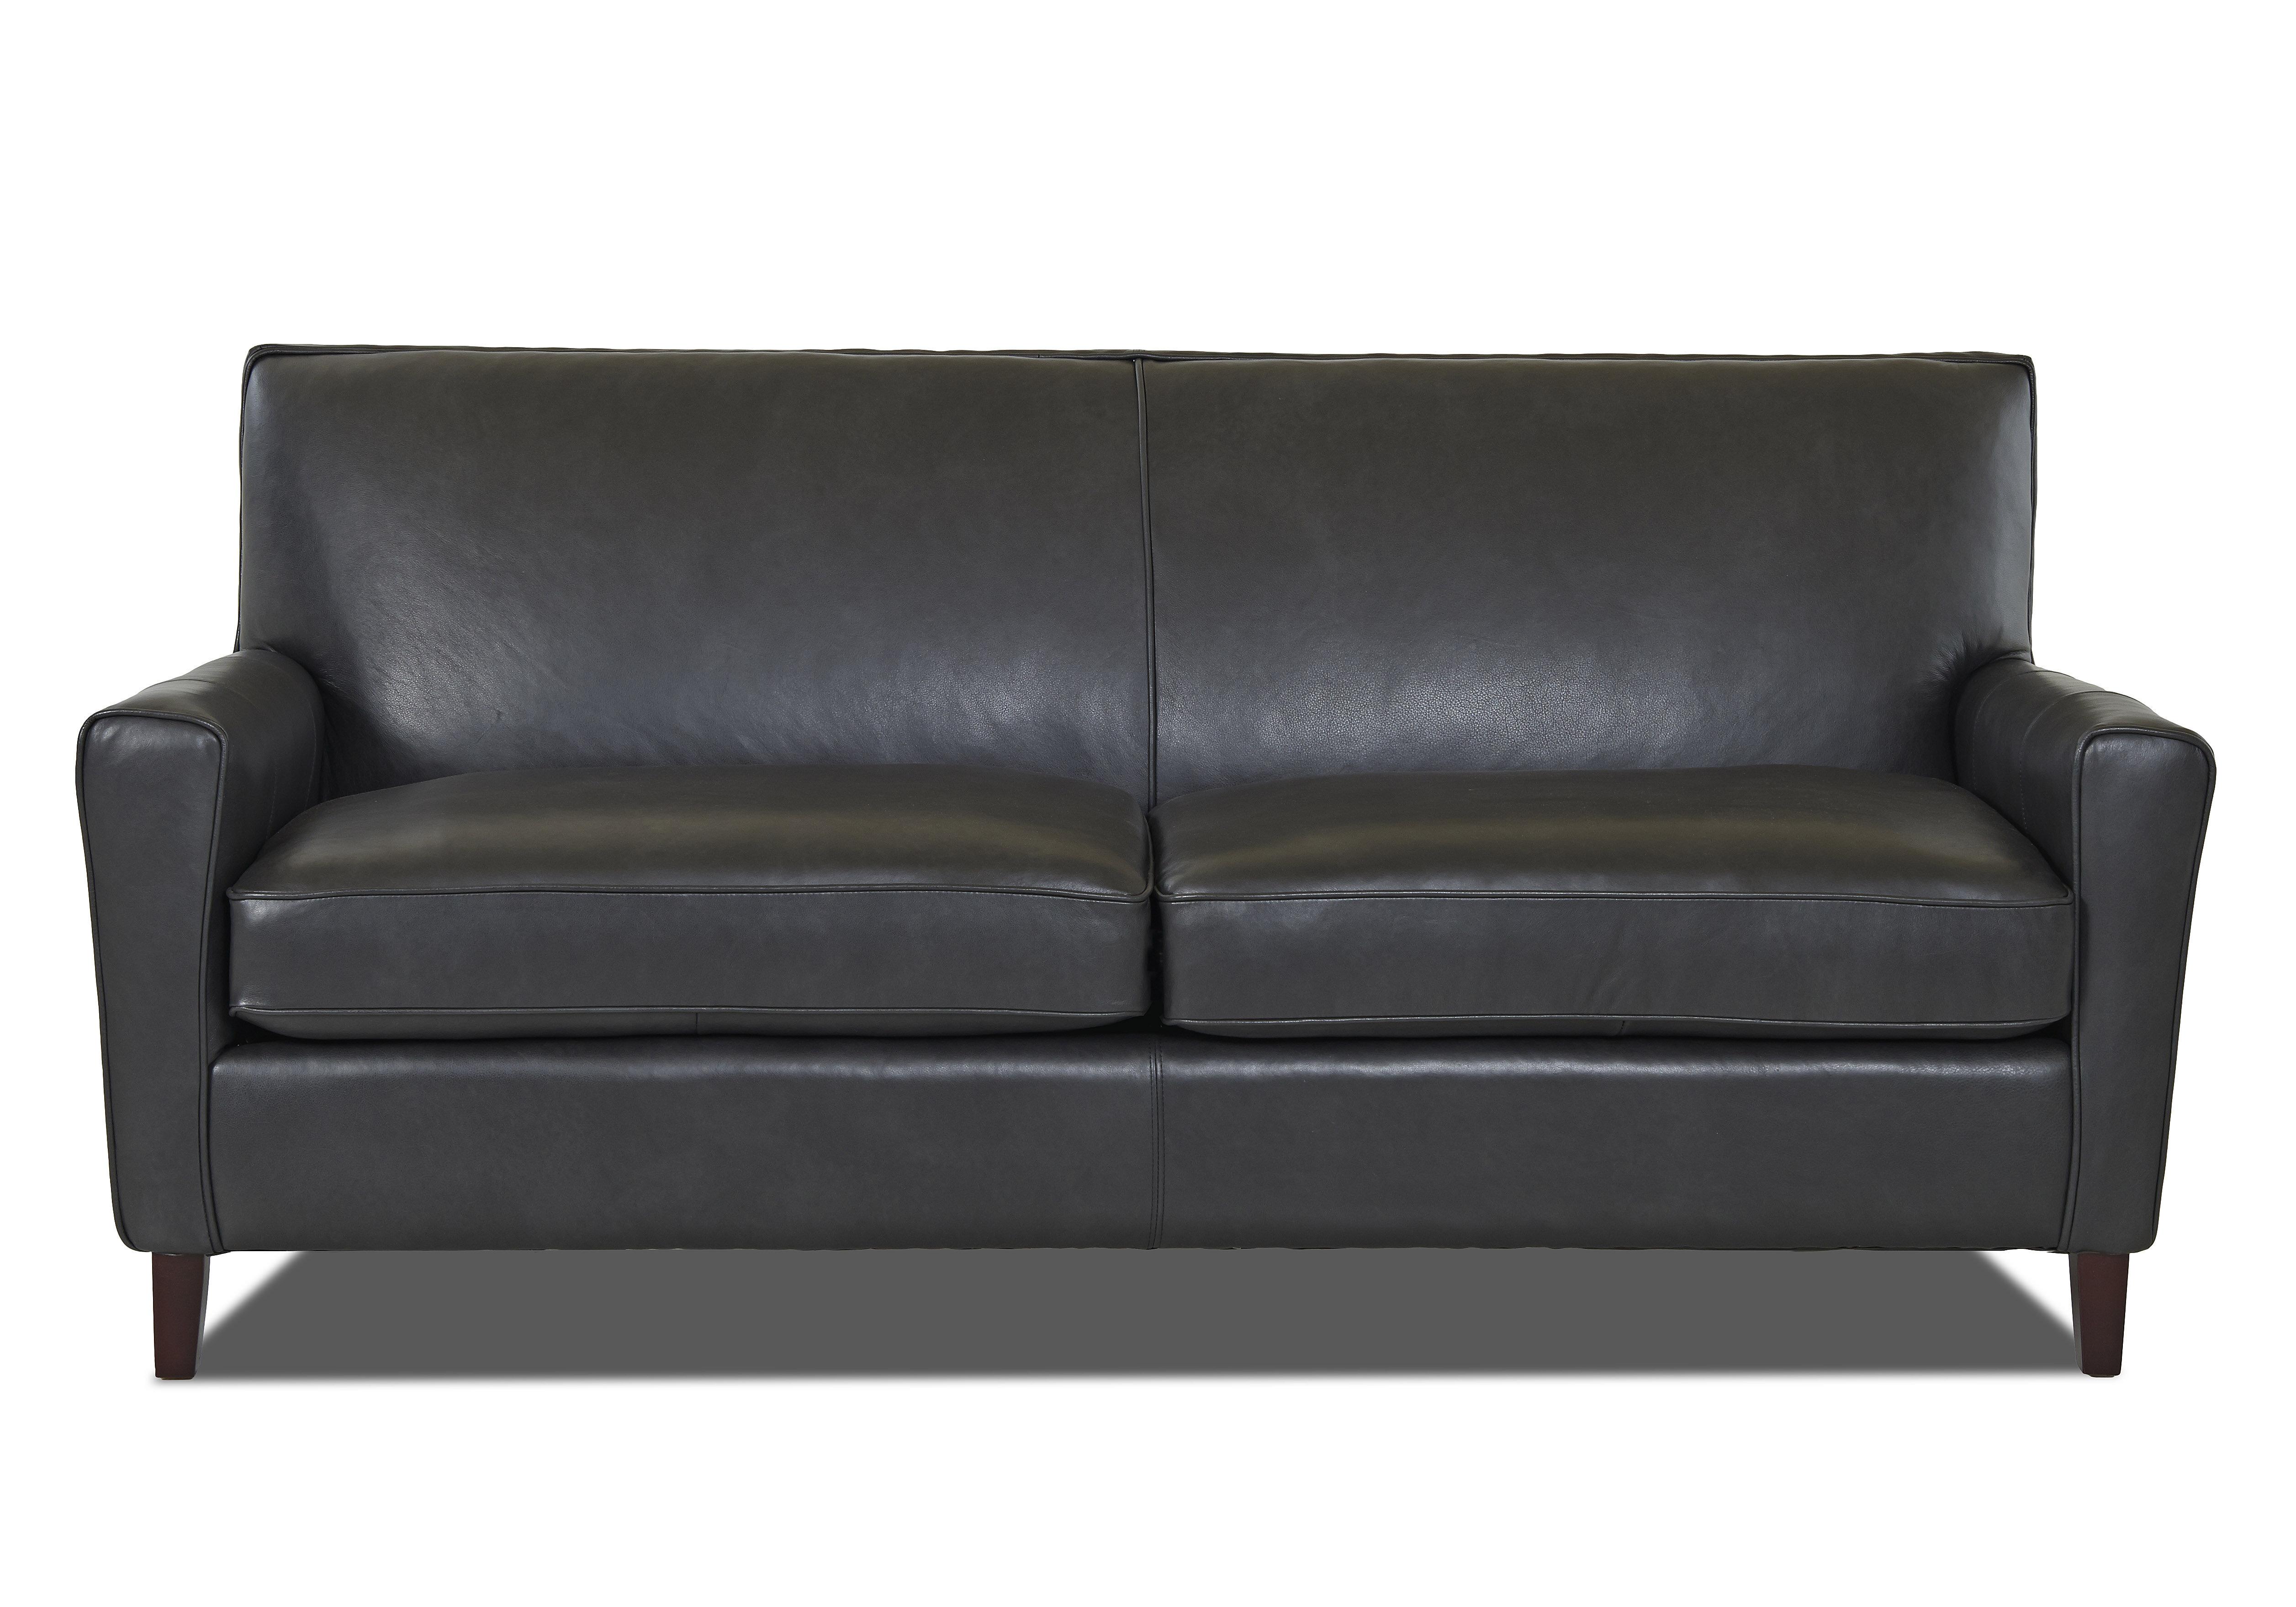 Beautiful Wayfair Custom Upholstery™ Grayson Leather Sofa & Reviews | Wayfair LB71